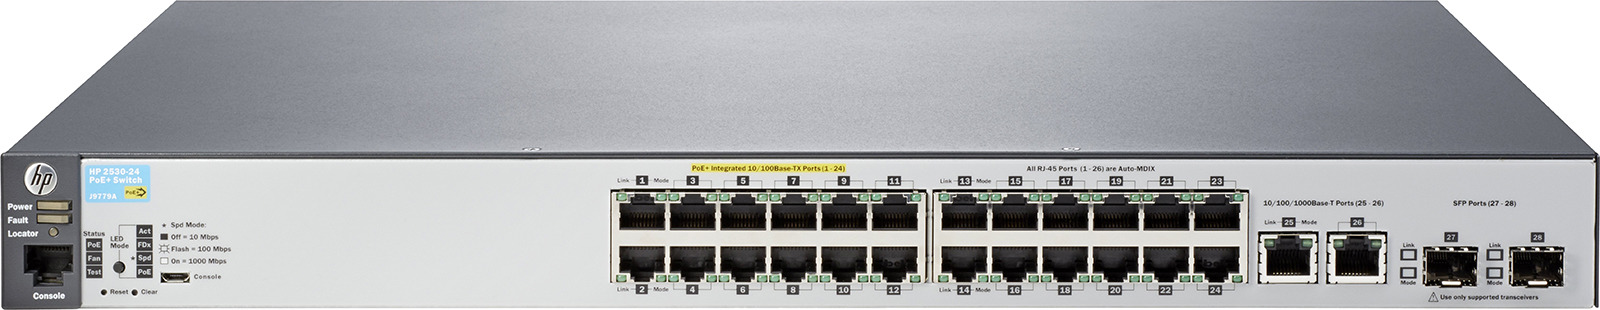 Коммутатор HPE 2530, управляемый, J9779A коммутатор hpe 1820 24g poe управляемый j9983a